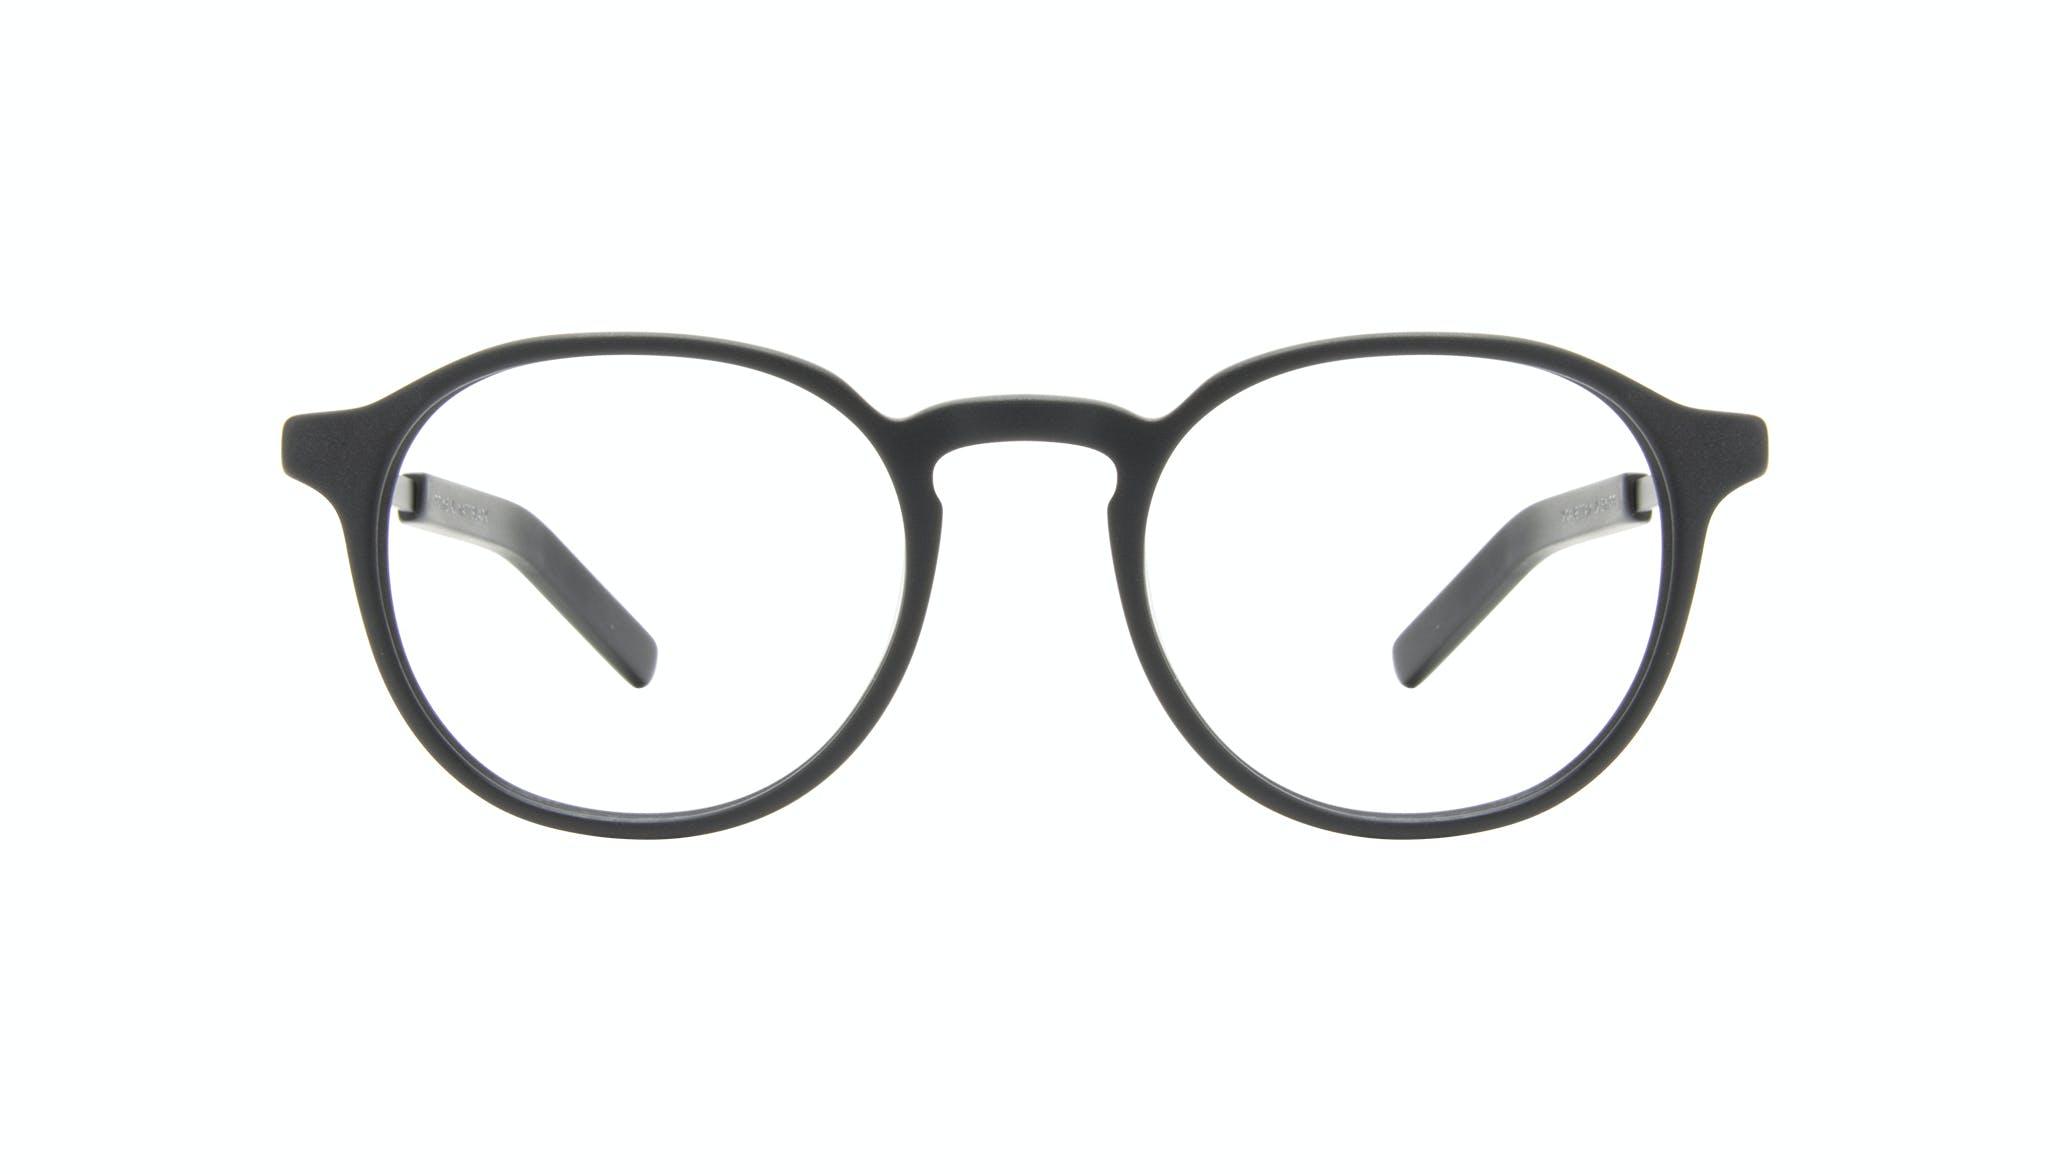 Affordable Fashion Glasses Round Eyeglasses Men Prime XL Matte Black Front